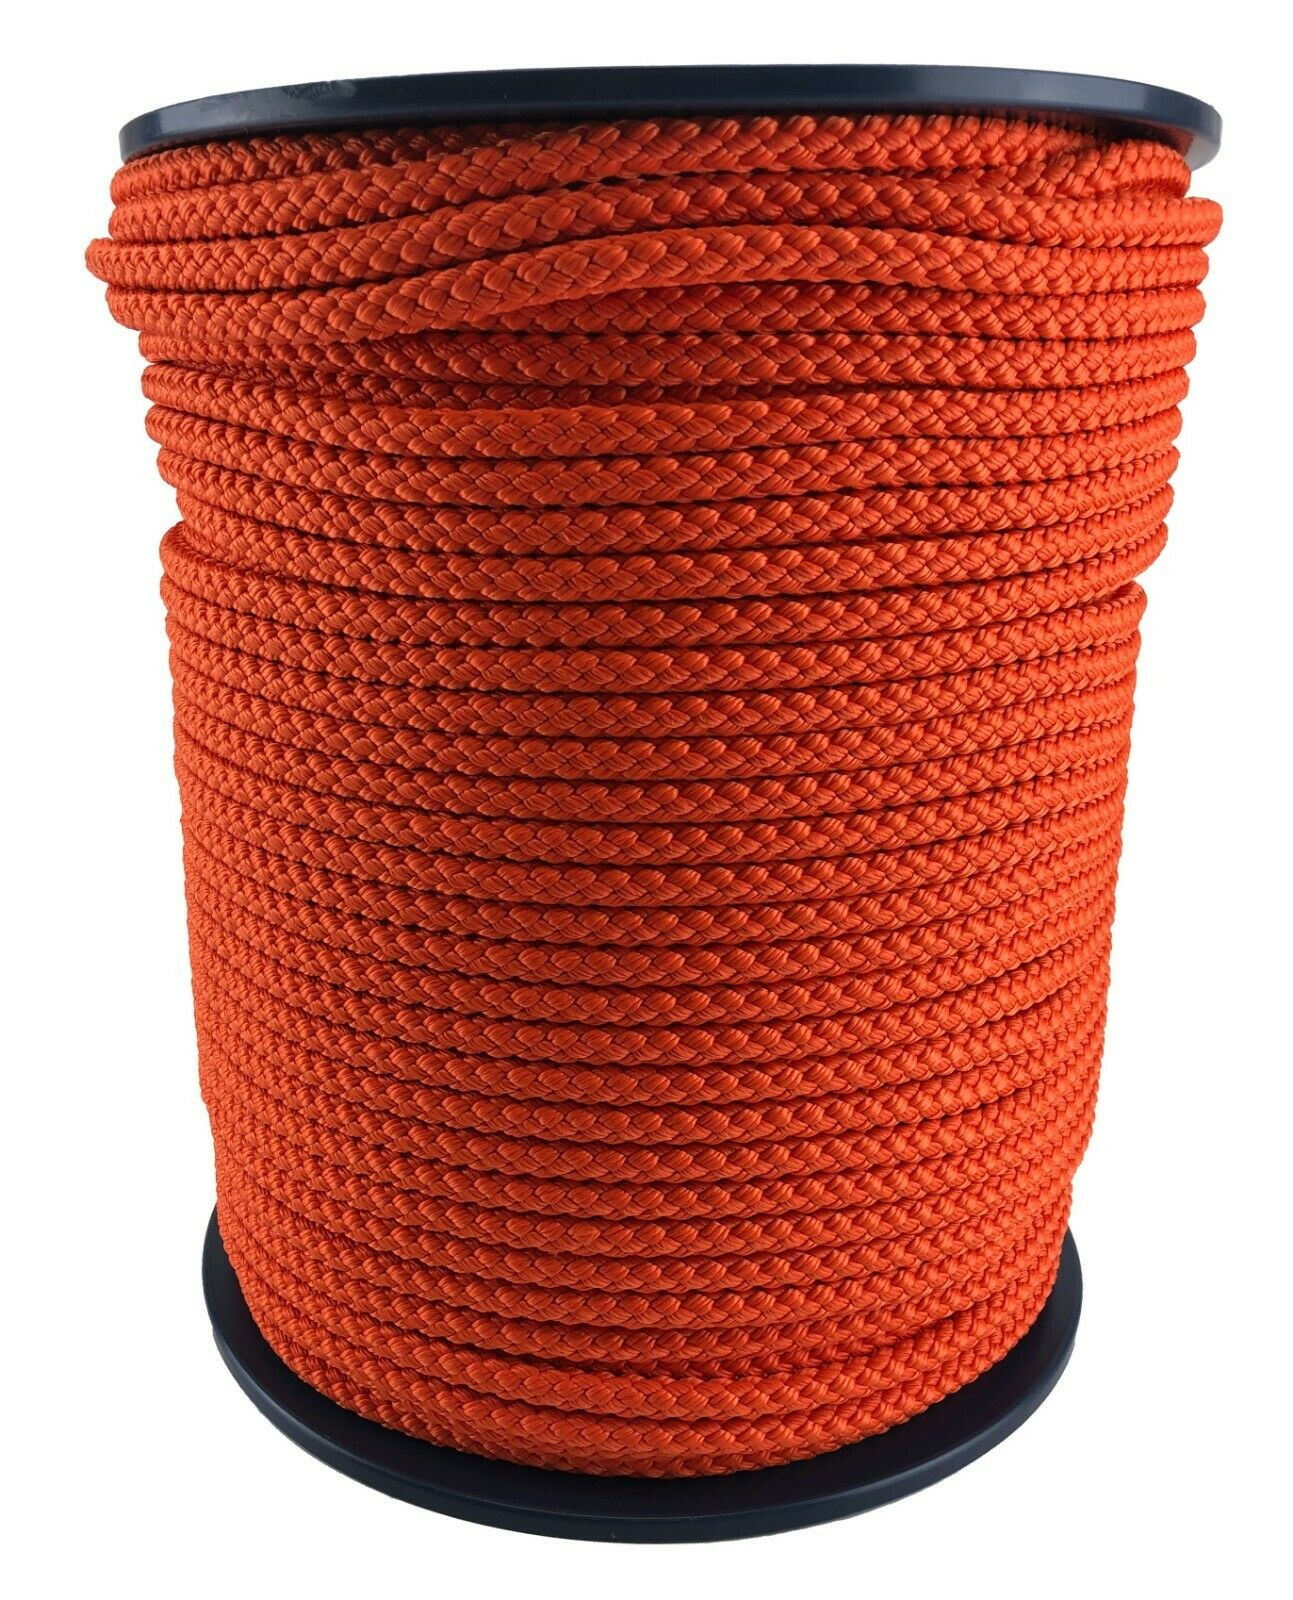 10mm Naranja Trenzado Polipropileno Cuerda Paracord con Cordón Vela